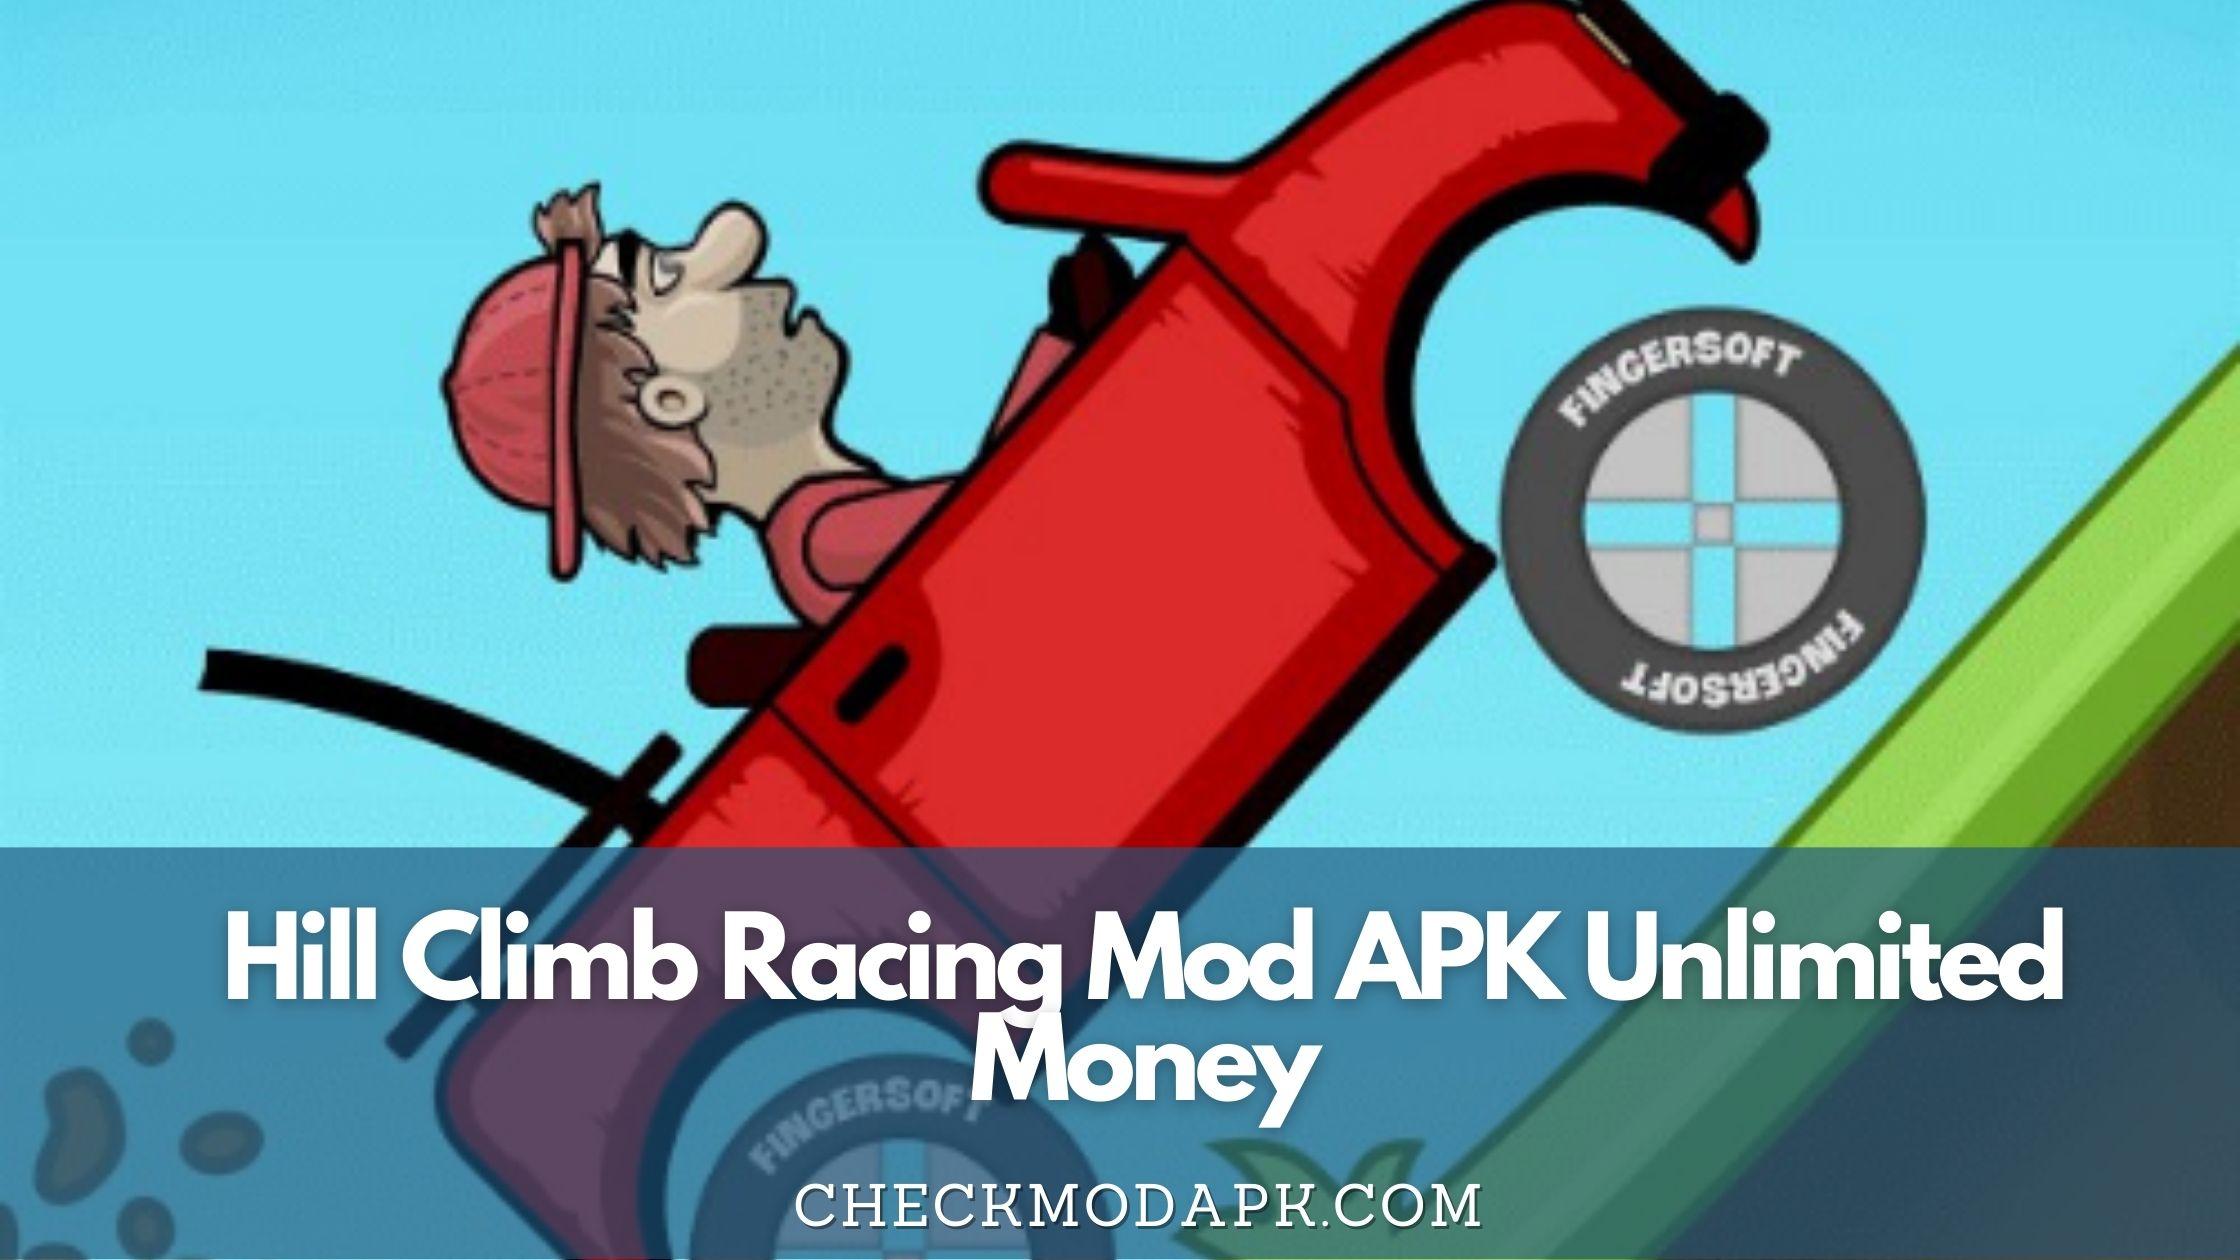 Hill Climb Racing Mod APK Unlimited Money